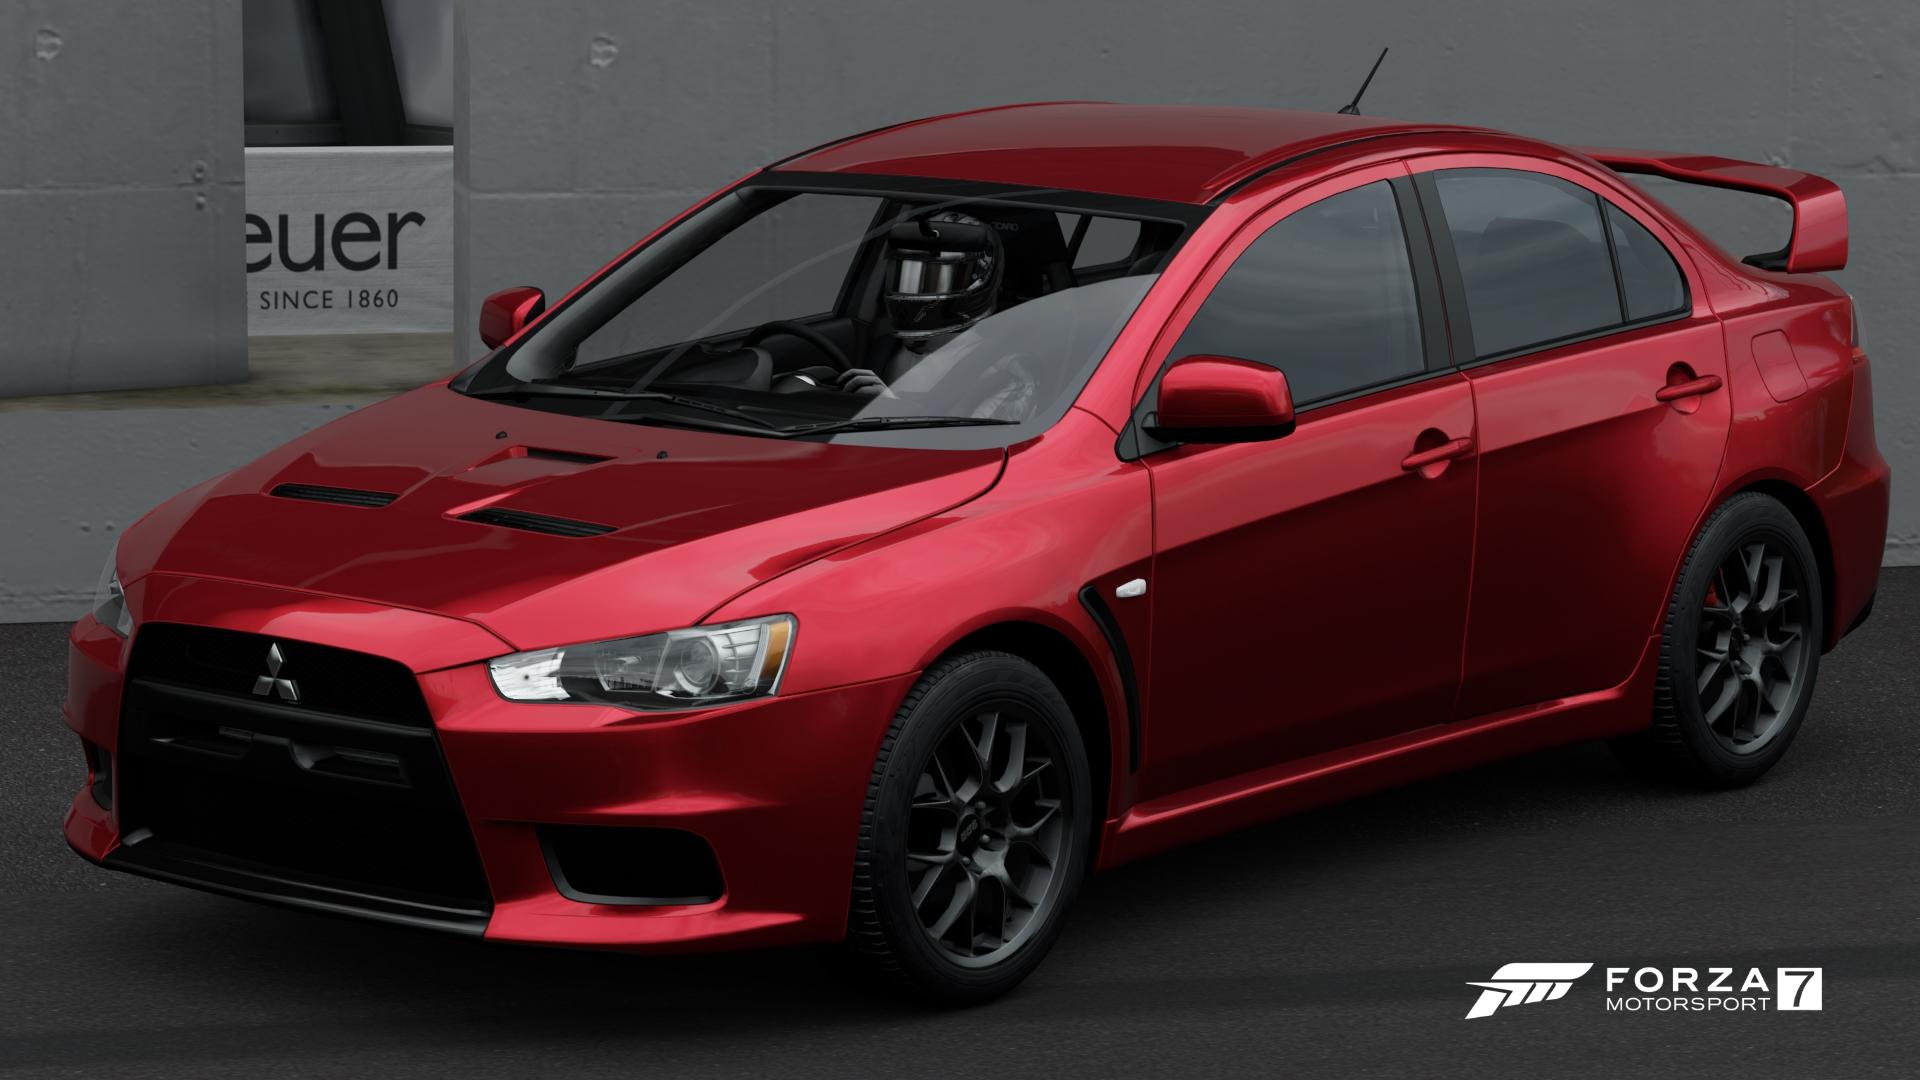 Mitsubishi Lancer Evolution >> Mitsubishi Lancer Evolution X GSR | Forza Motorsport Wiki | FANDOM powered by Wikia